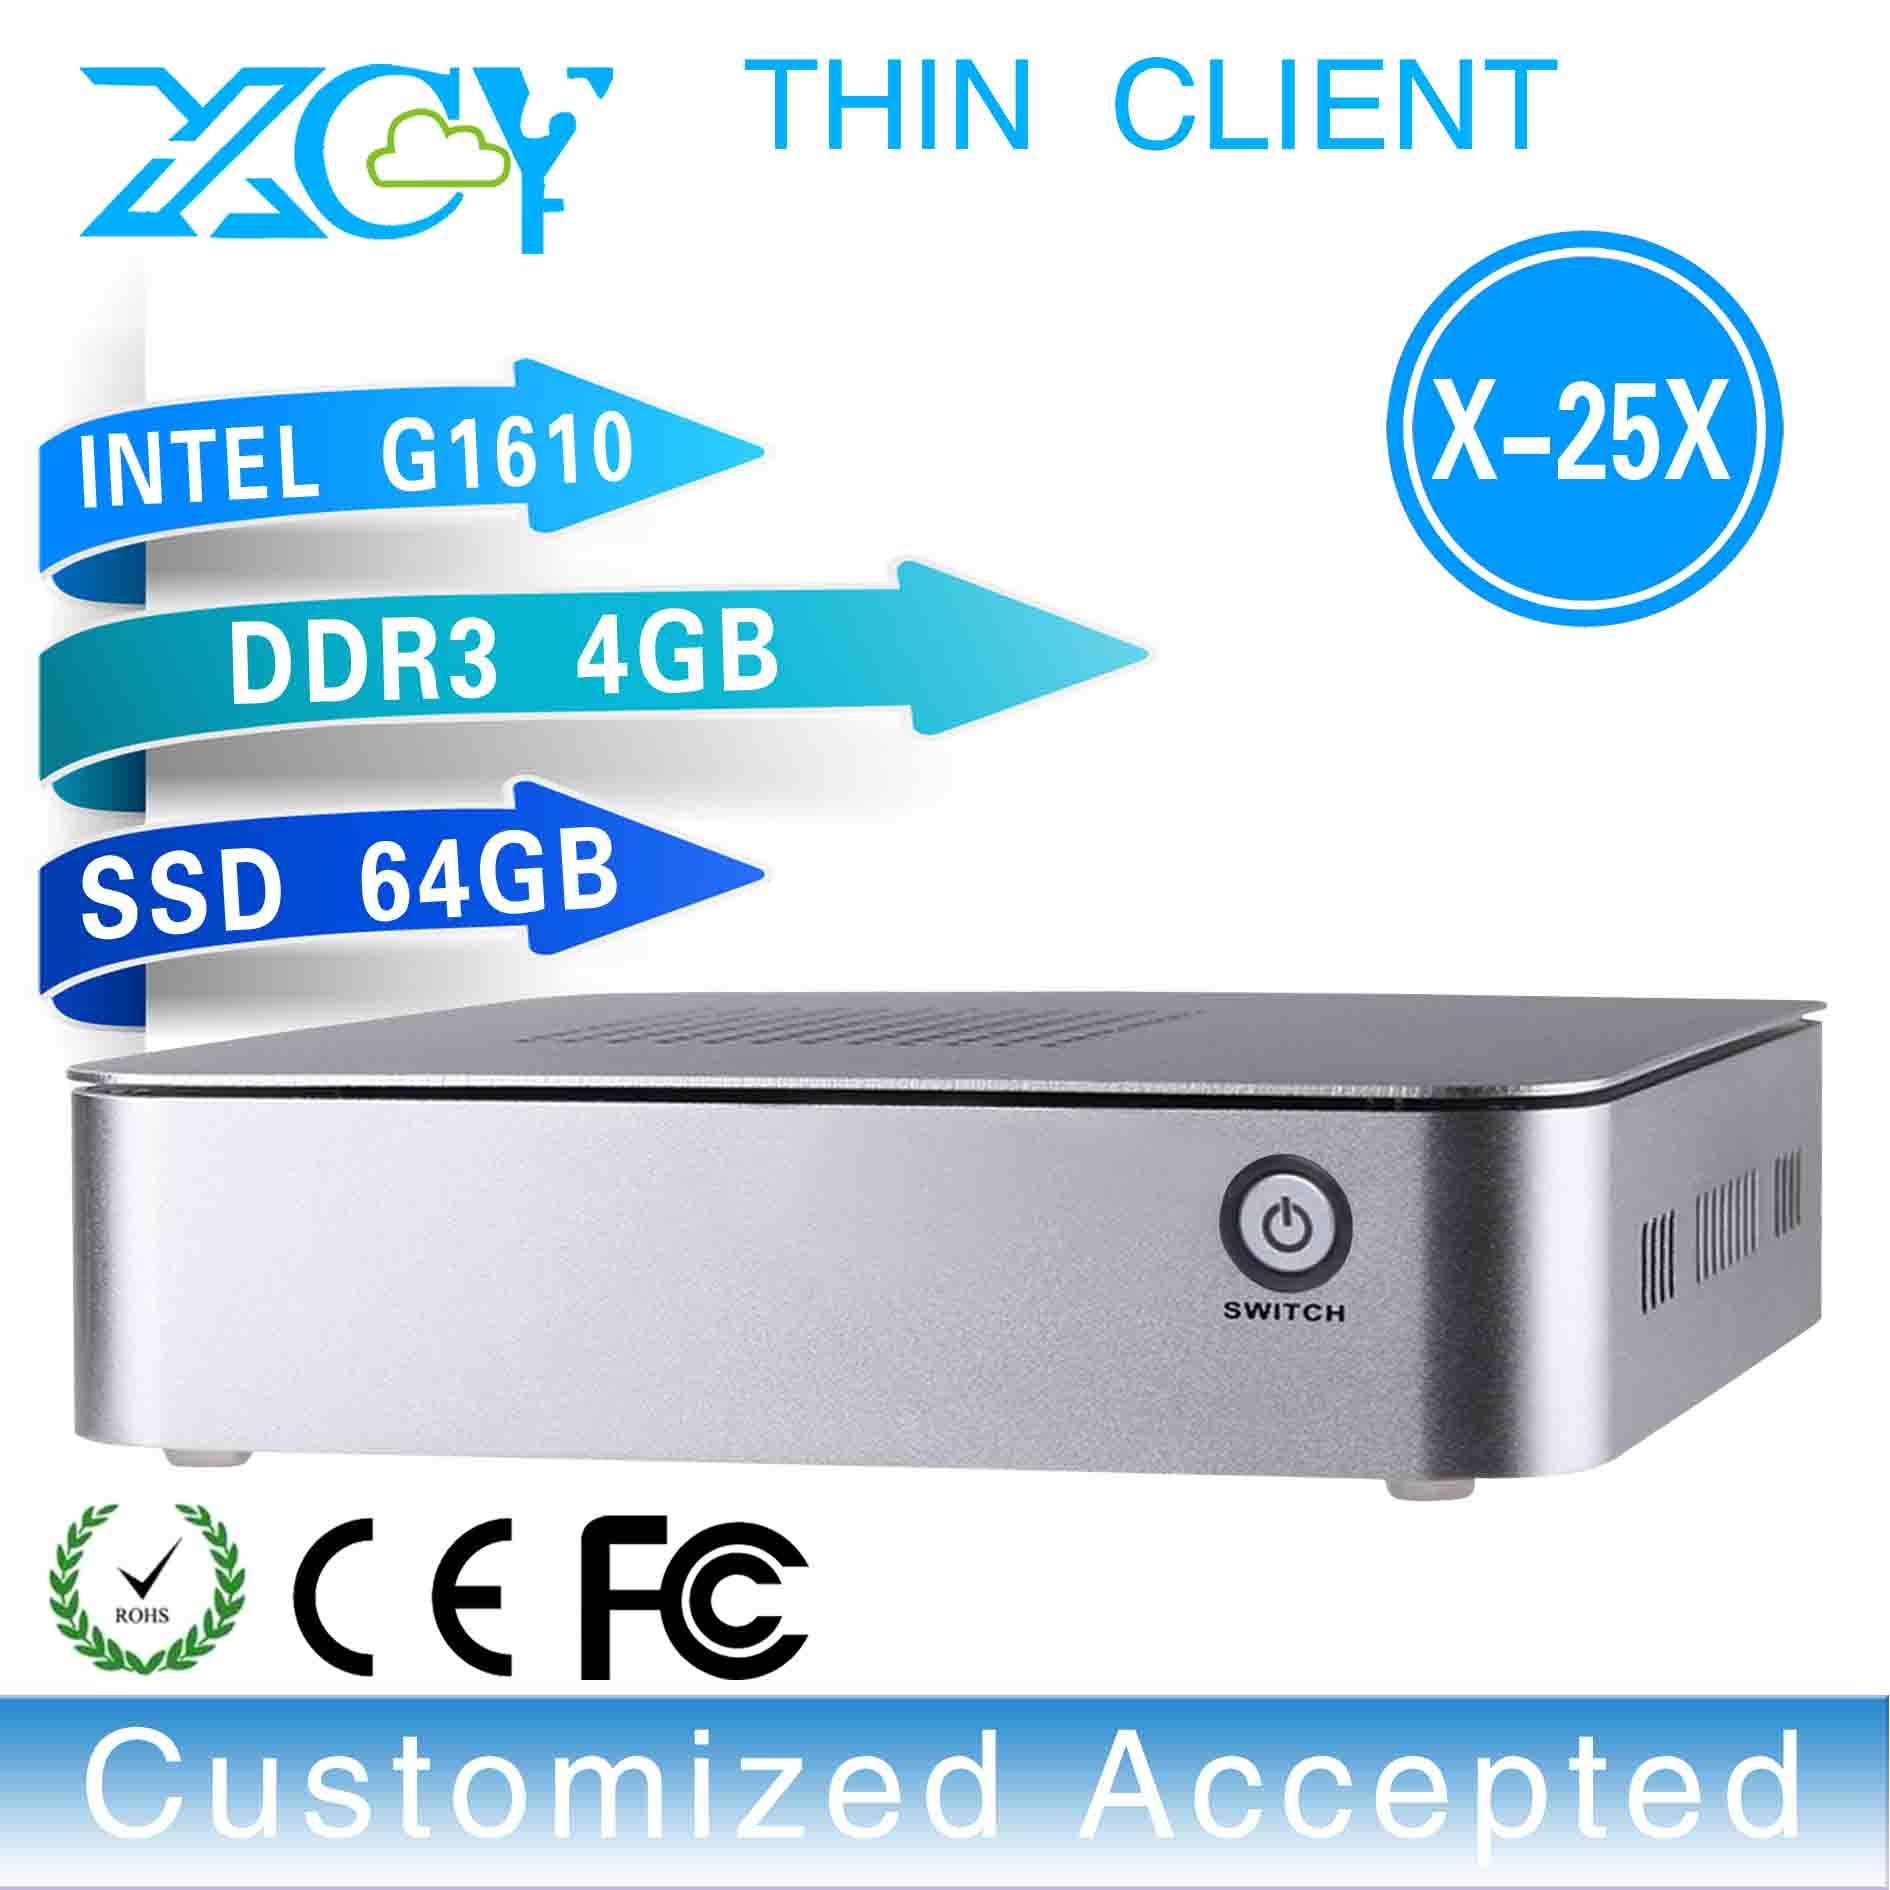 Ultra Thin Mini PC Thin Client Pc Wifi Thin Computer Support Ubuntu Linux X-25x G1610 2.6ghz 4GB RAM 64GB SSD(China (Mainland))